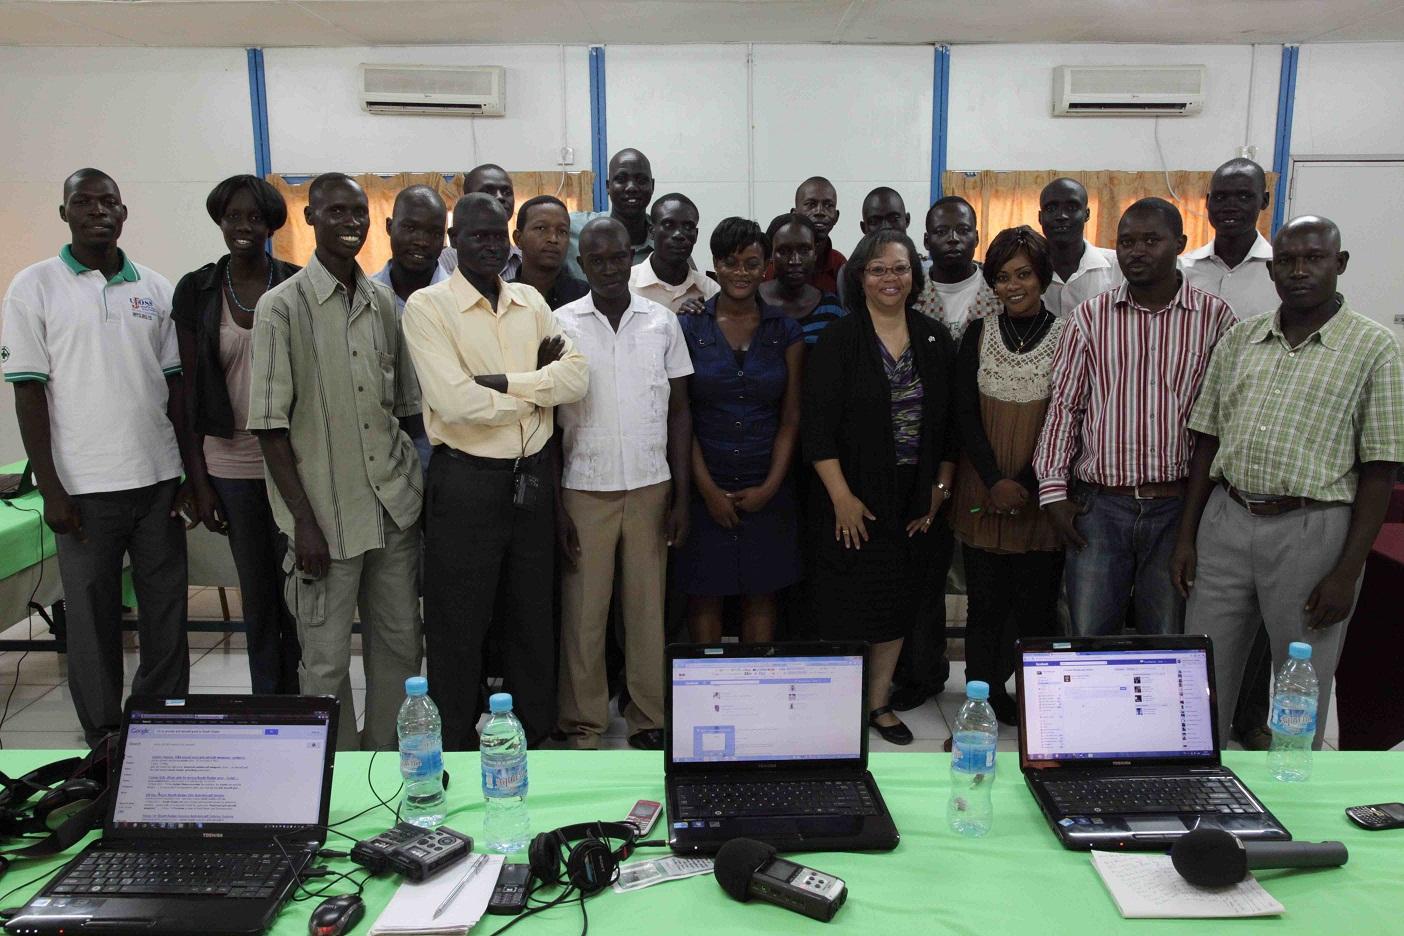 VOA training report – Juba, South Sudan, June 11 – 15, 2012